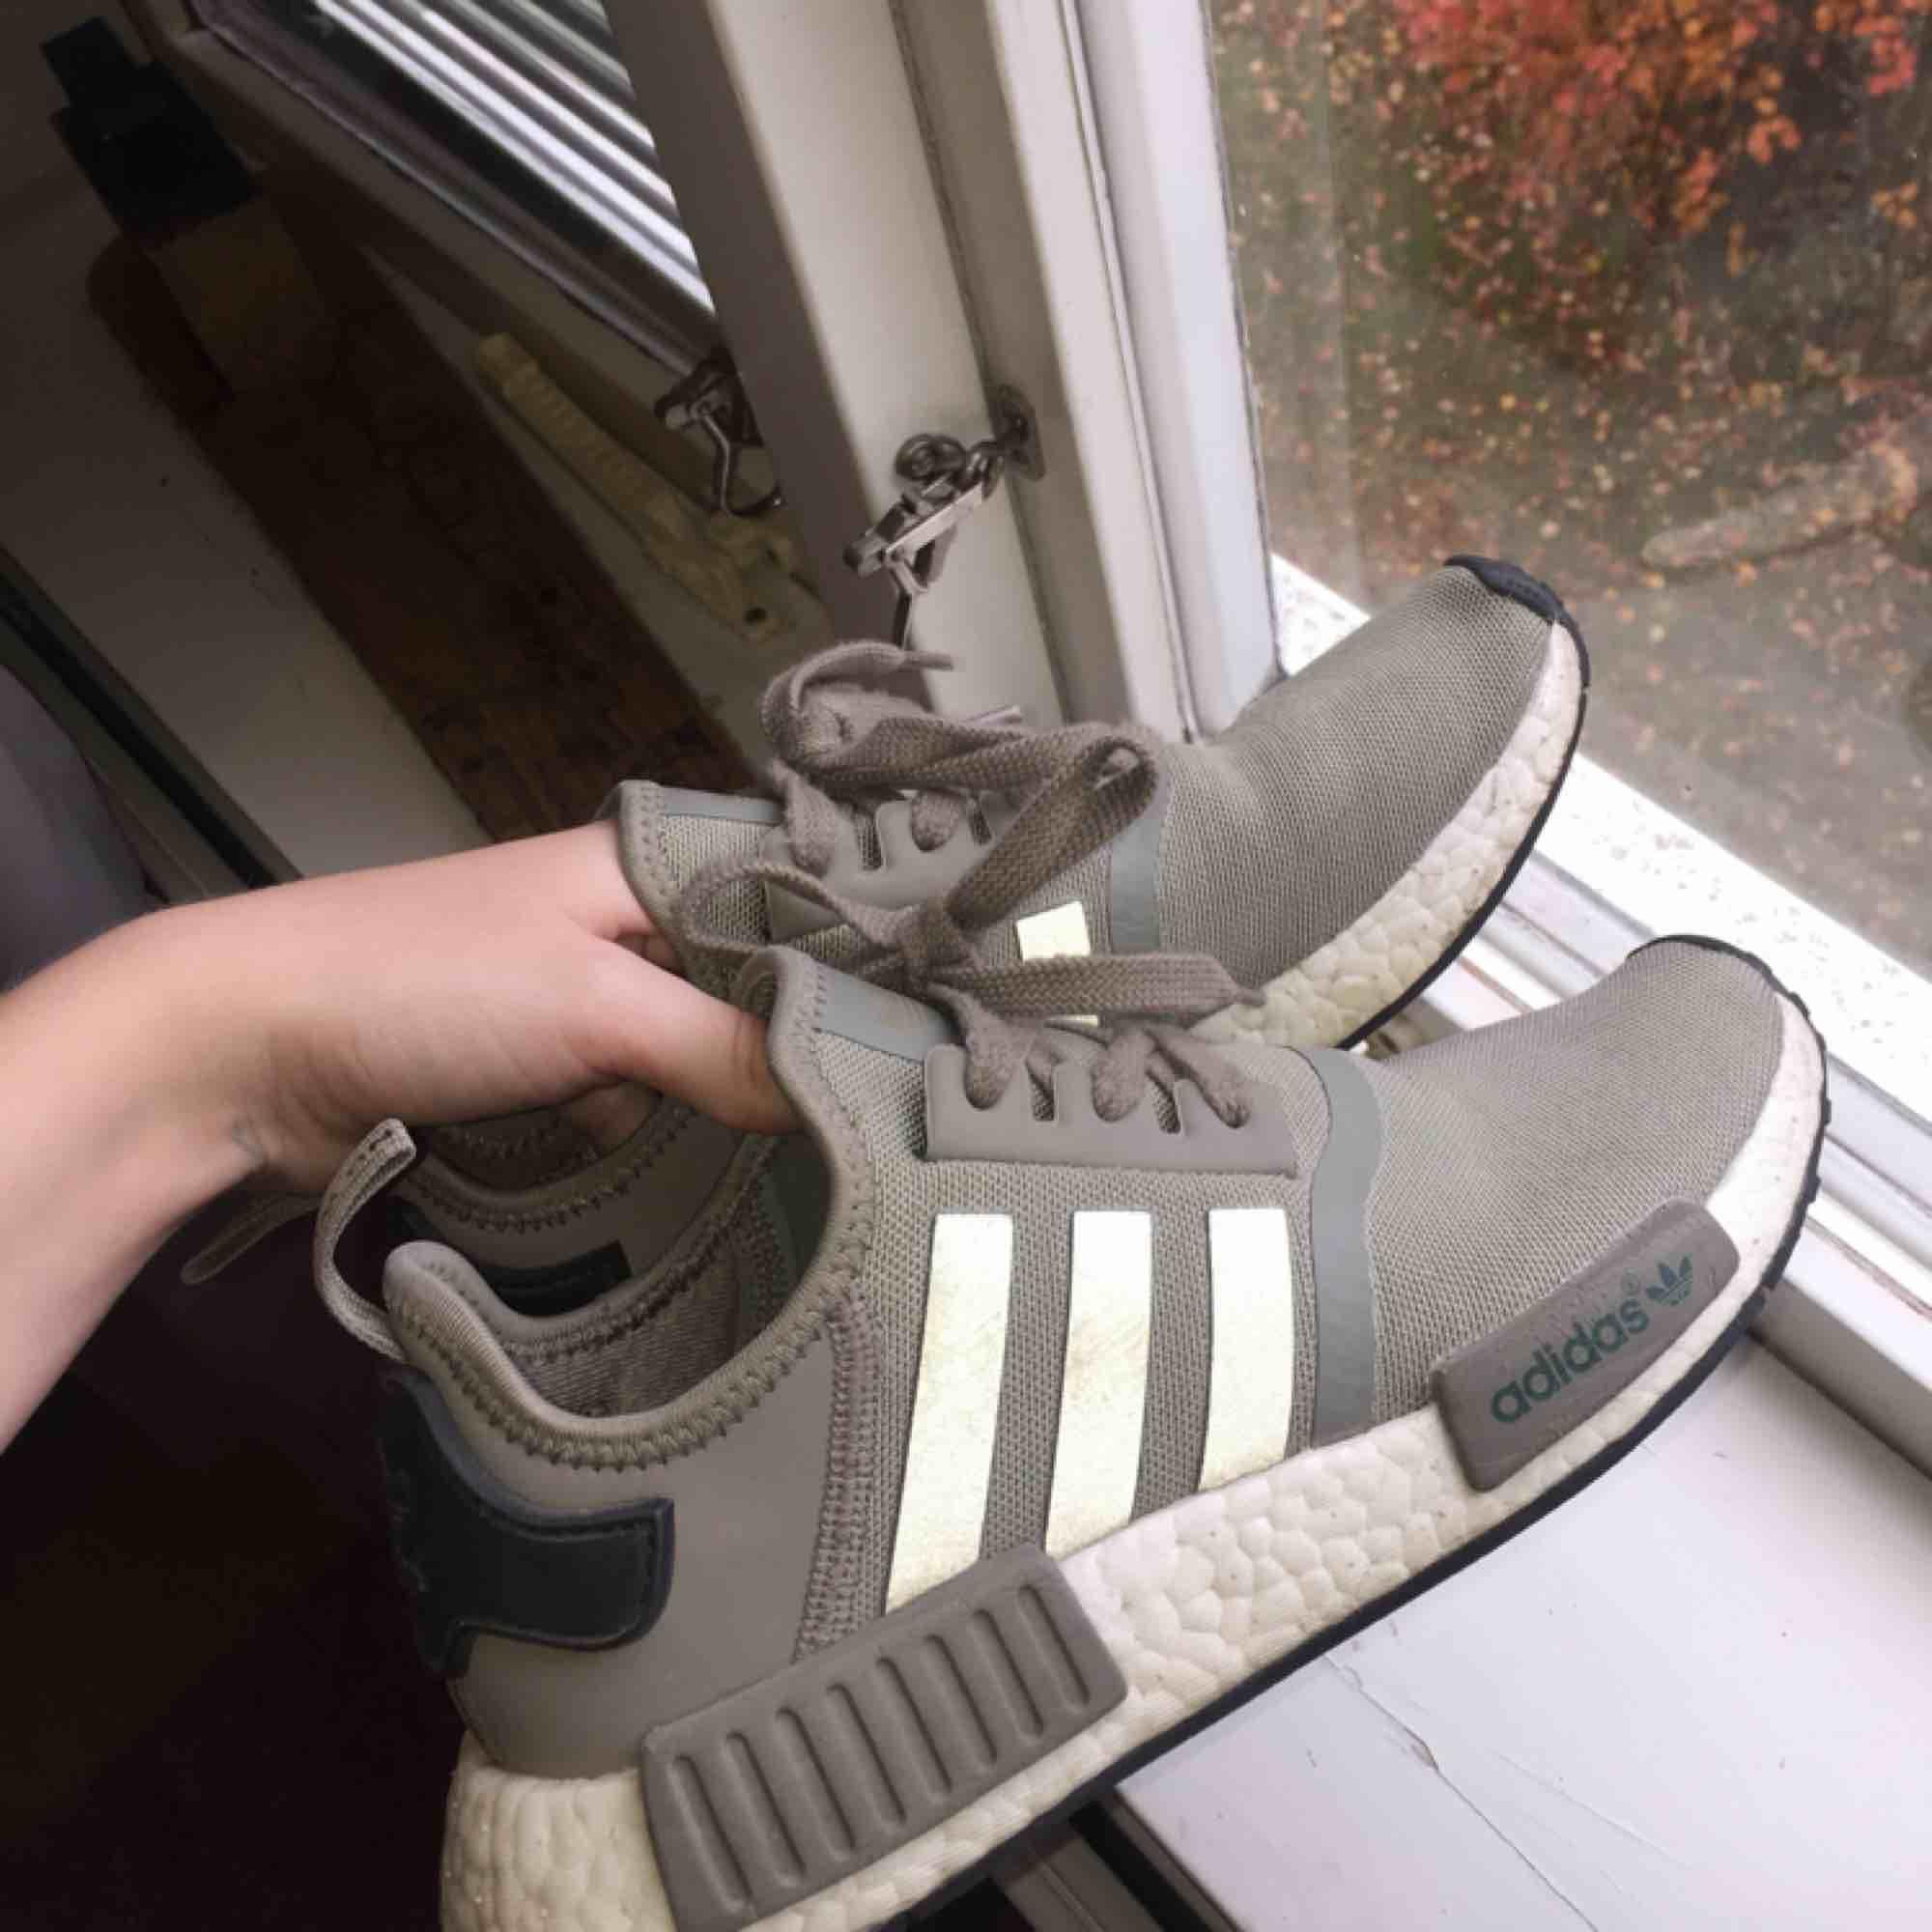 Adidas NMD R1 gröna skor. Storlek: 38 Bra skick lite slitna (kolla 3de bilden). Nypris 1400kr. Frakt ingår. Skor.